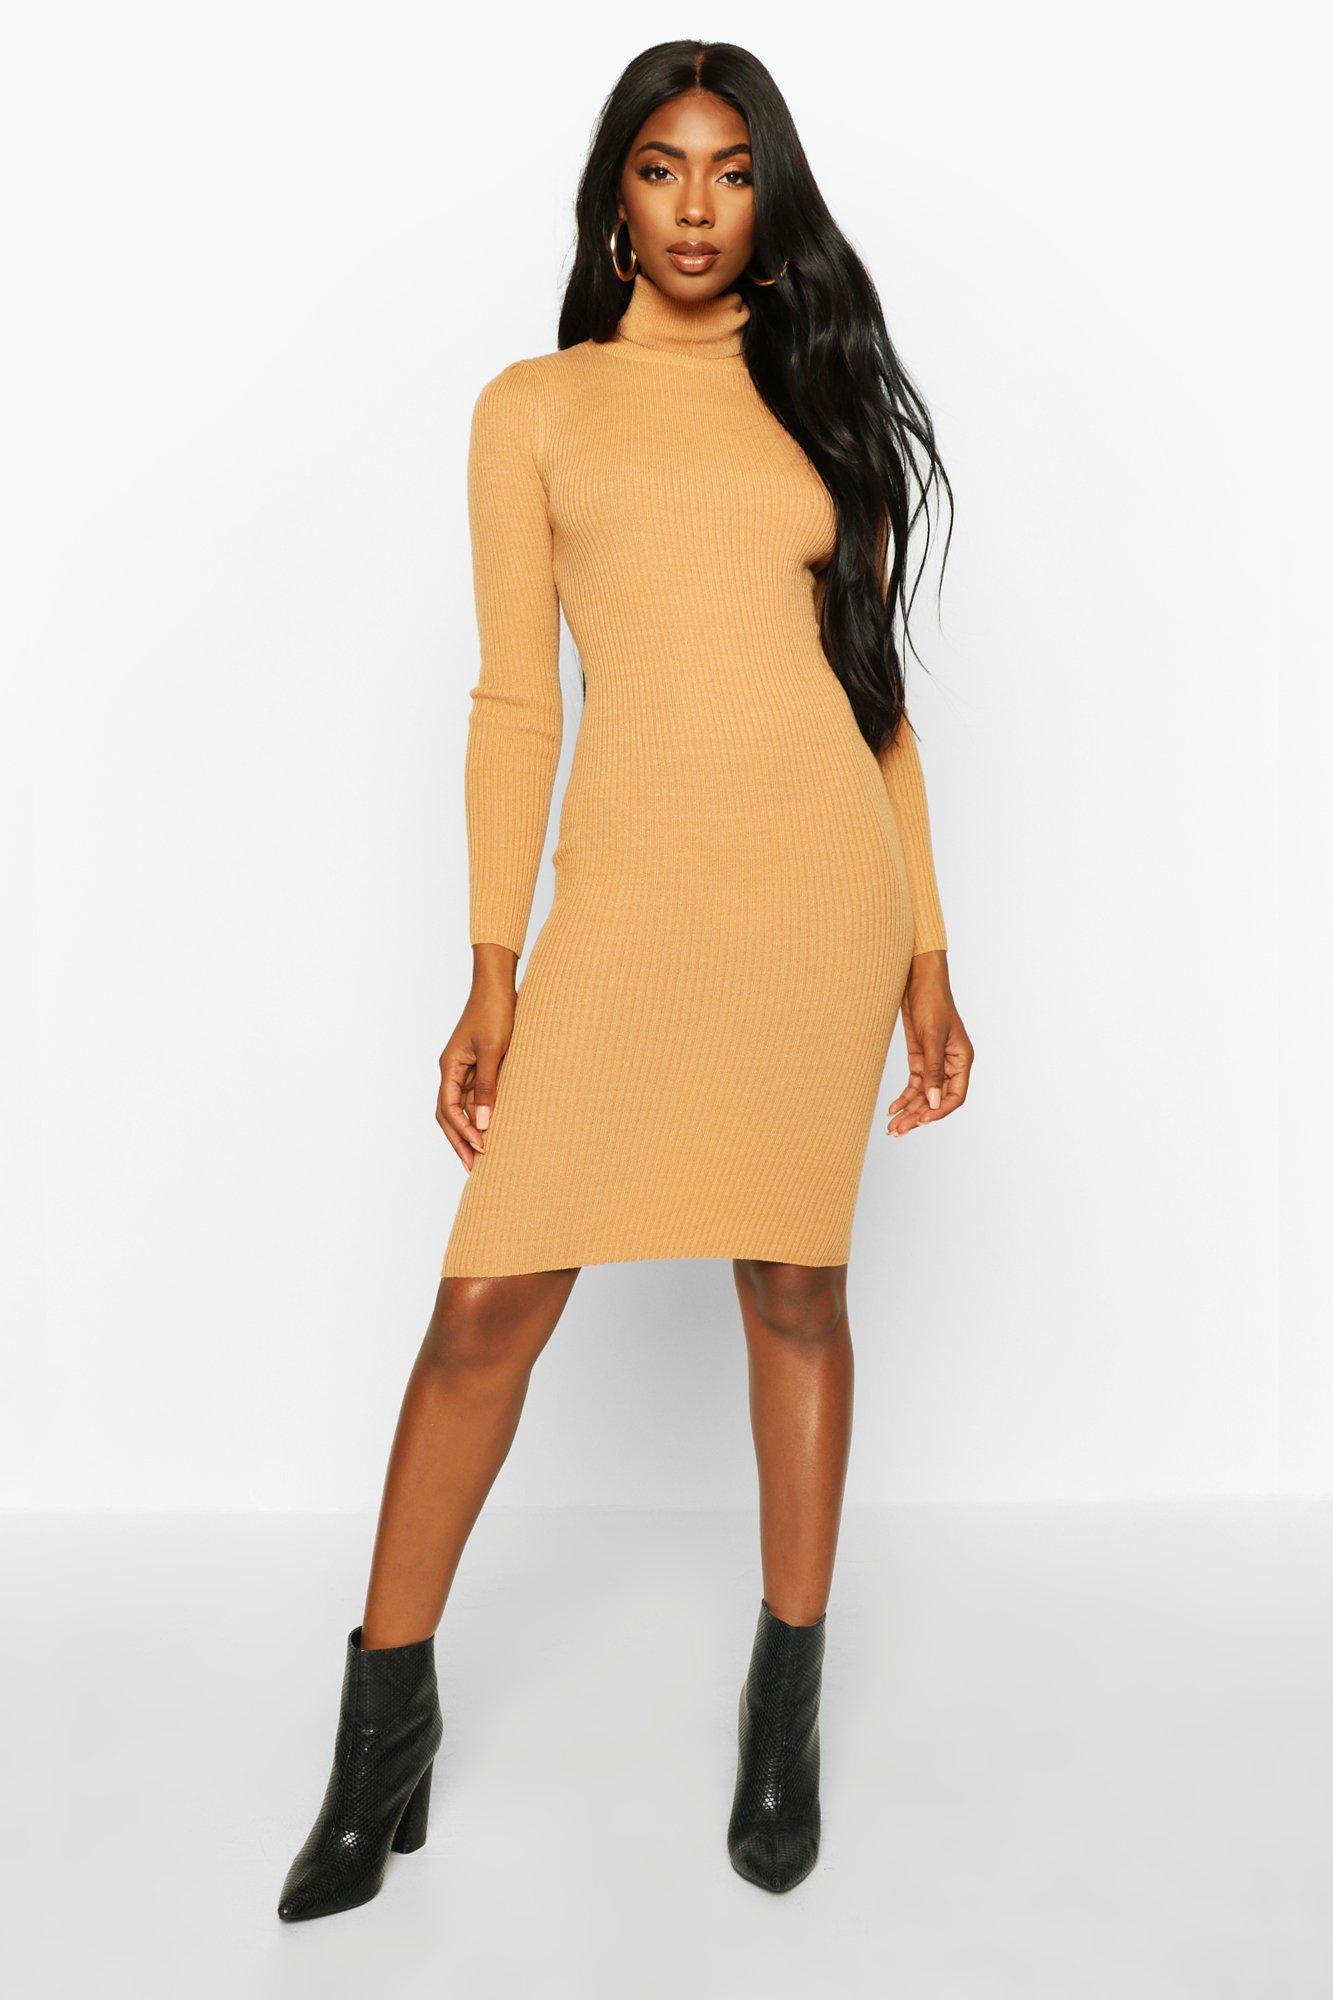 £5 Dresses Turtle Neck Rib Knit Midi Dress